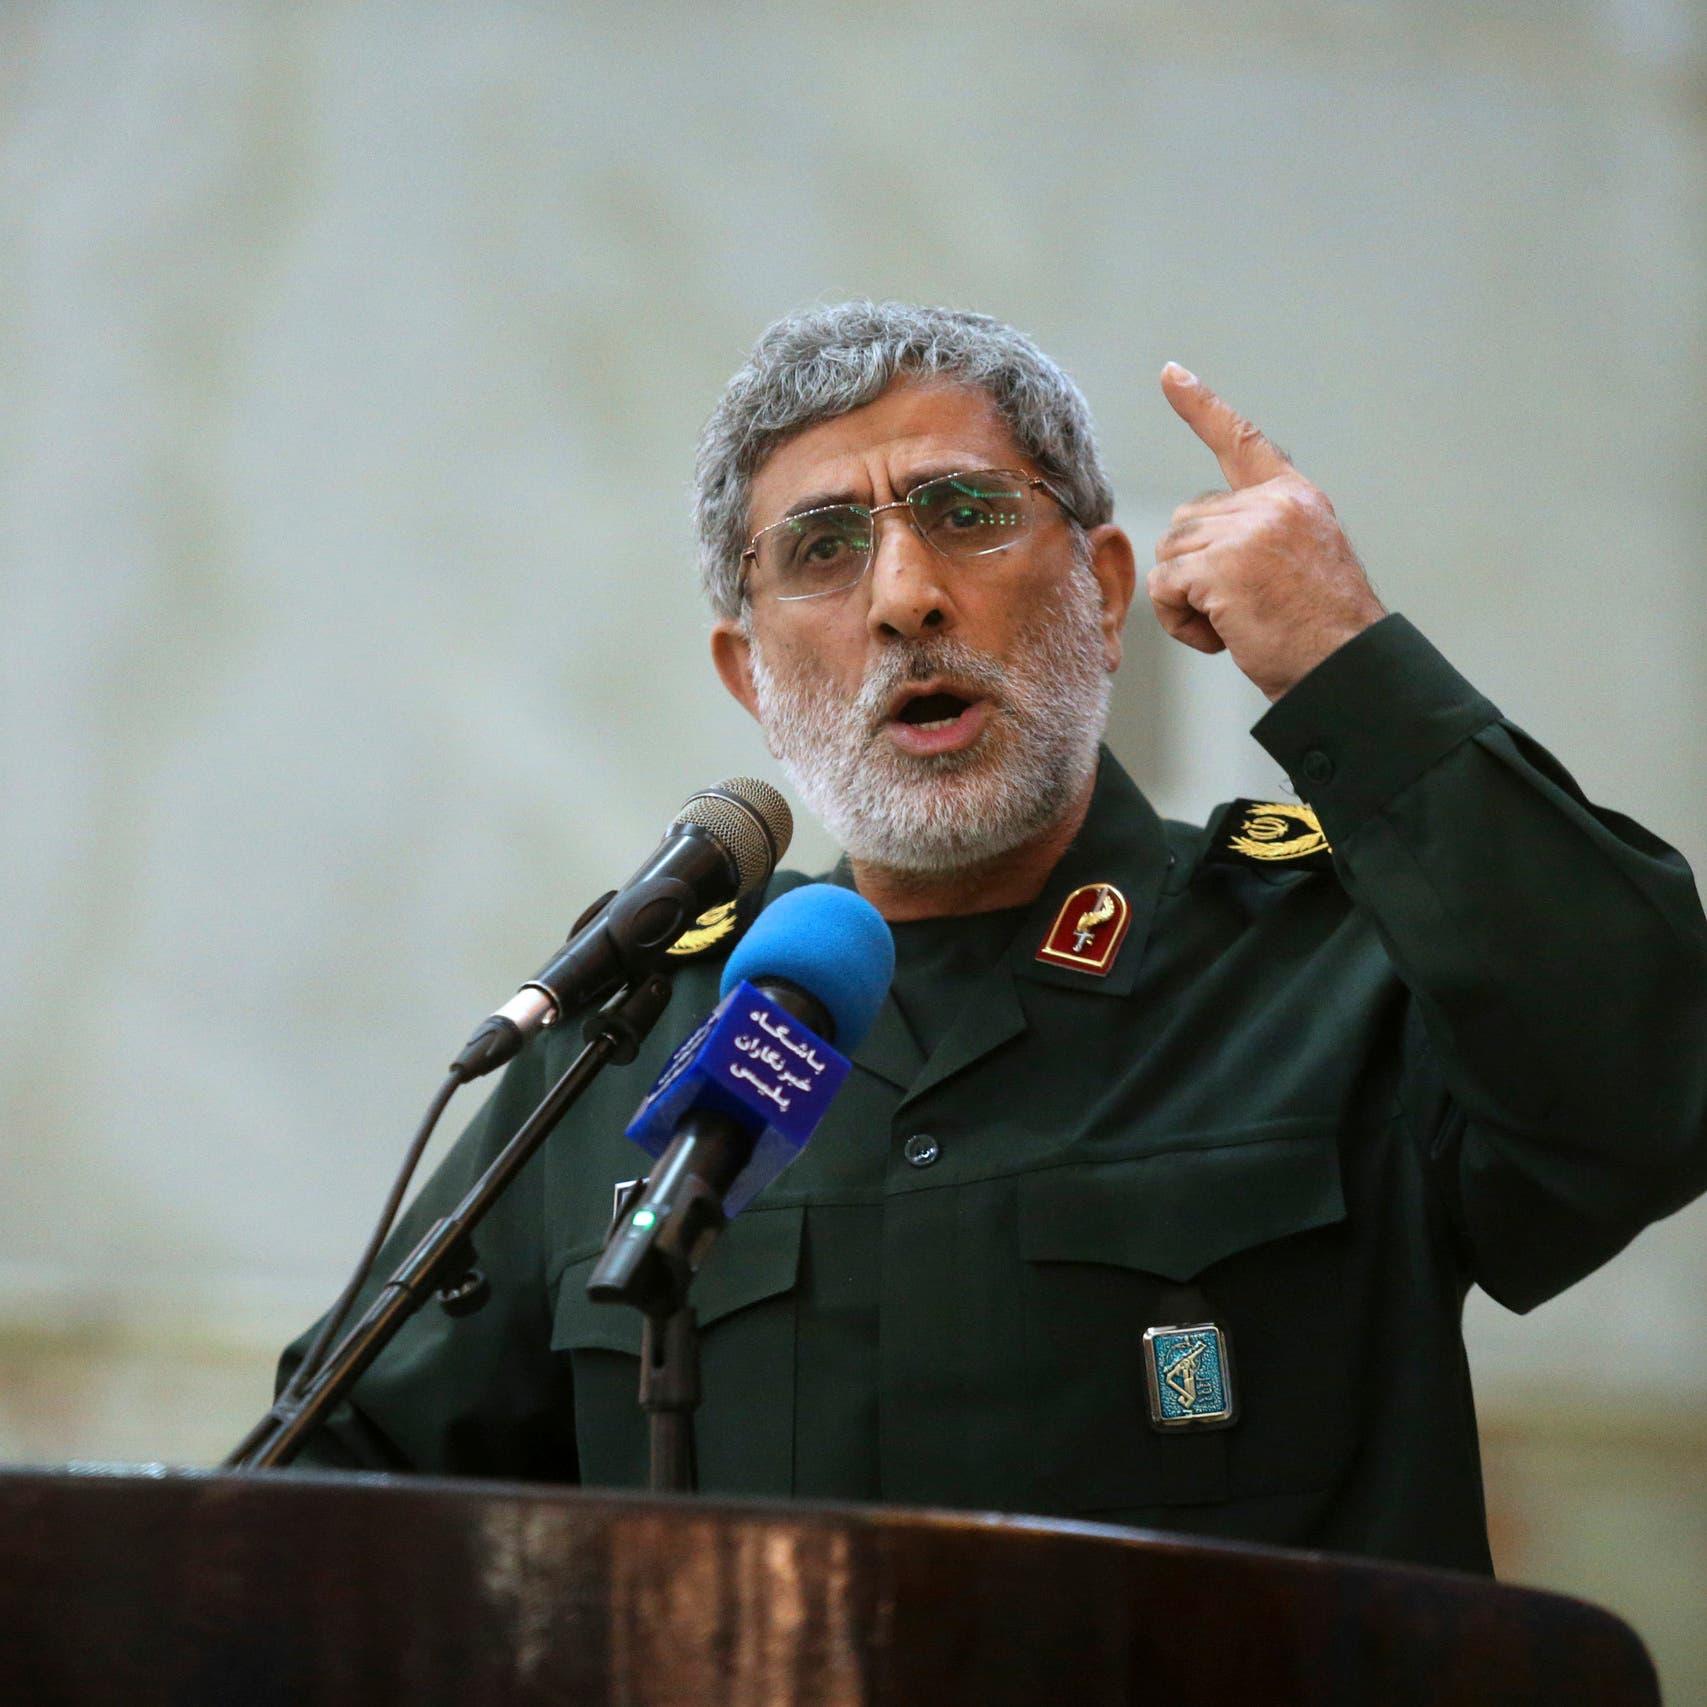 تقارير: قاآني زار لبنان وطلب من نصرالله عدم استفزاز إسرائيل